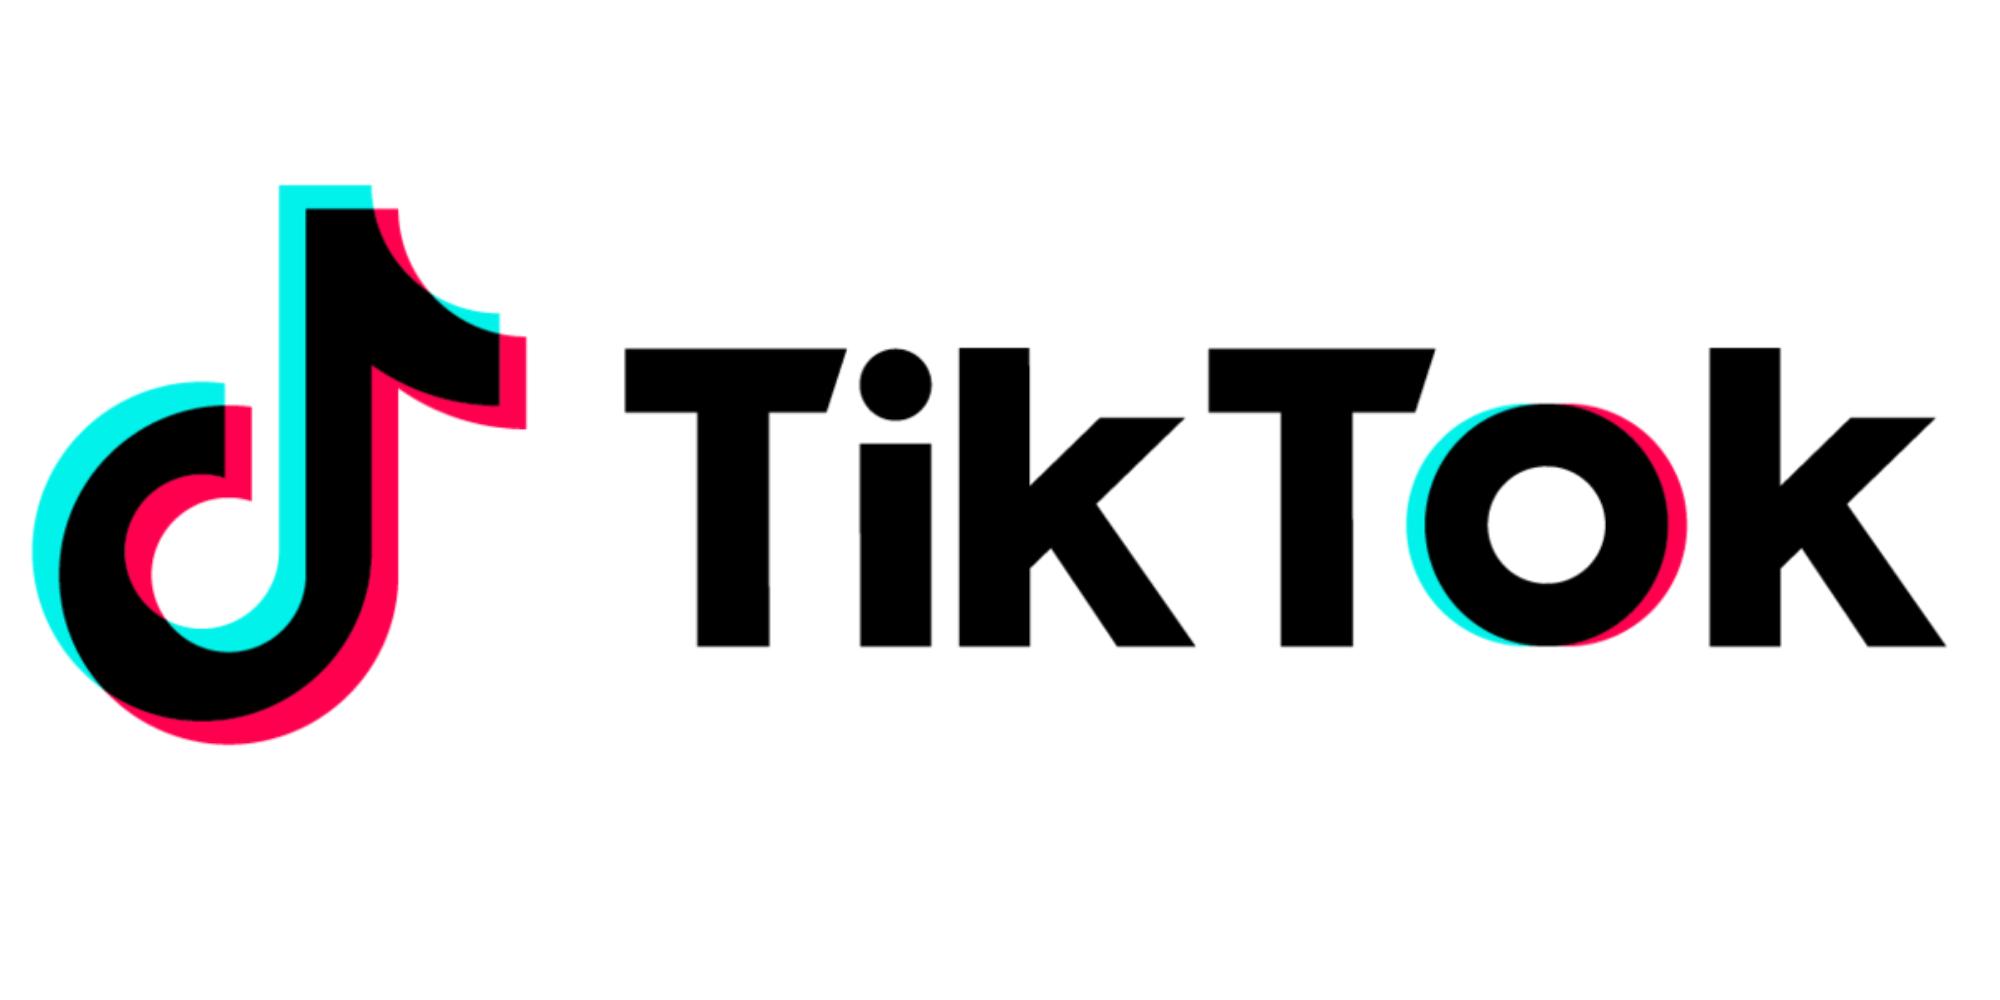 TikTok: Το παγκόσμιο φαινόμενο και η τεχνολογία deepfake που ανησυχεί επιστήμονες ασφάλειας και χρήστες